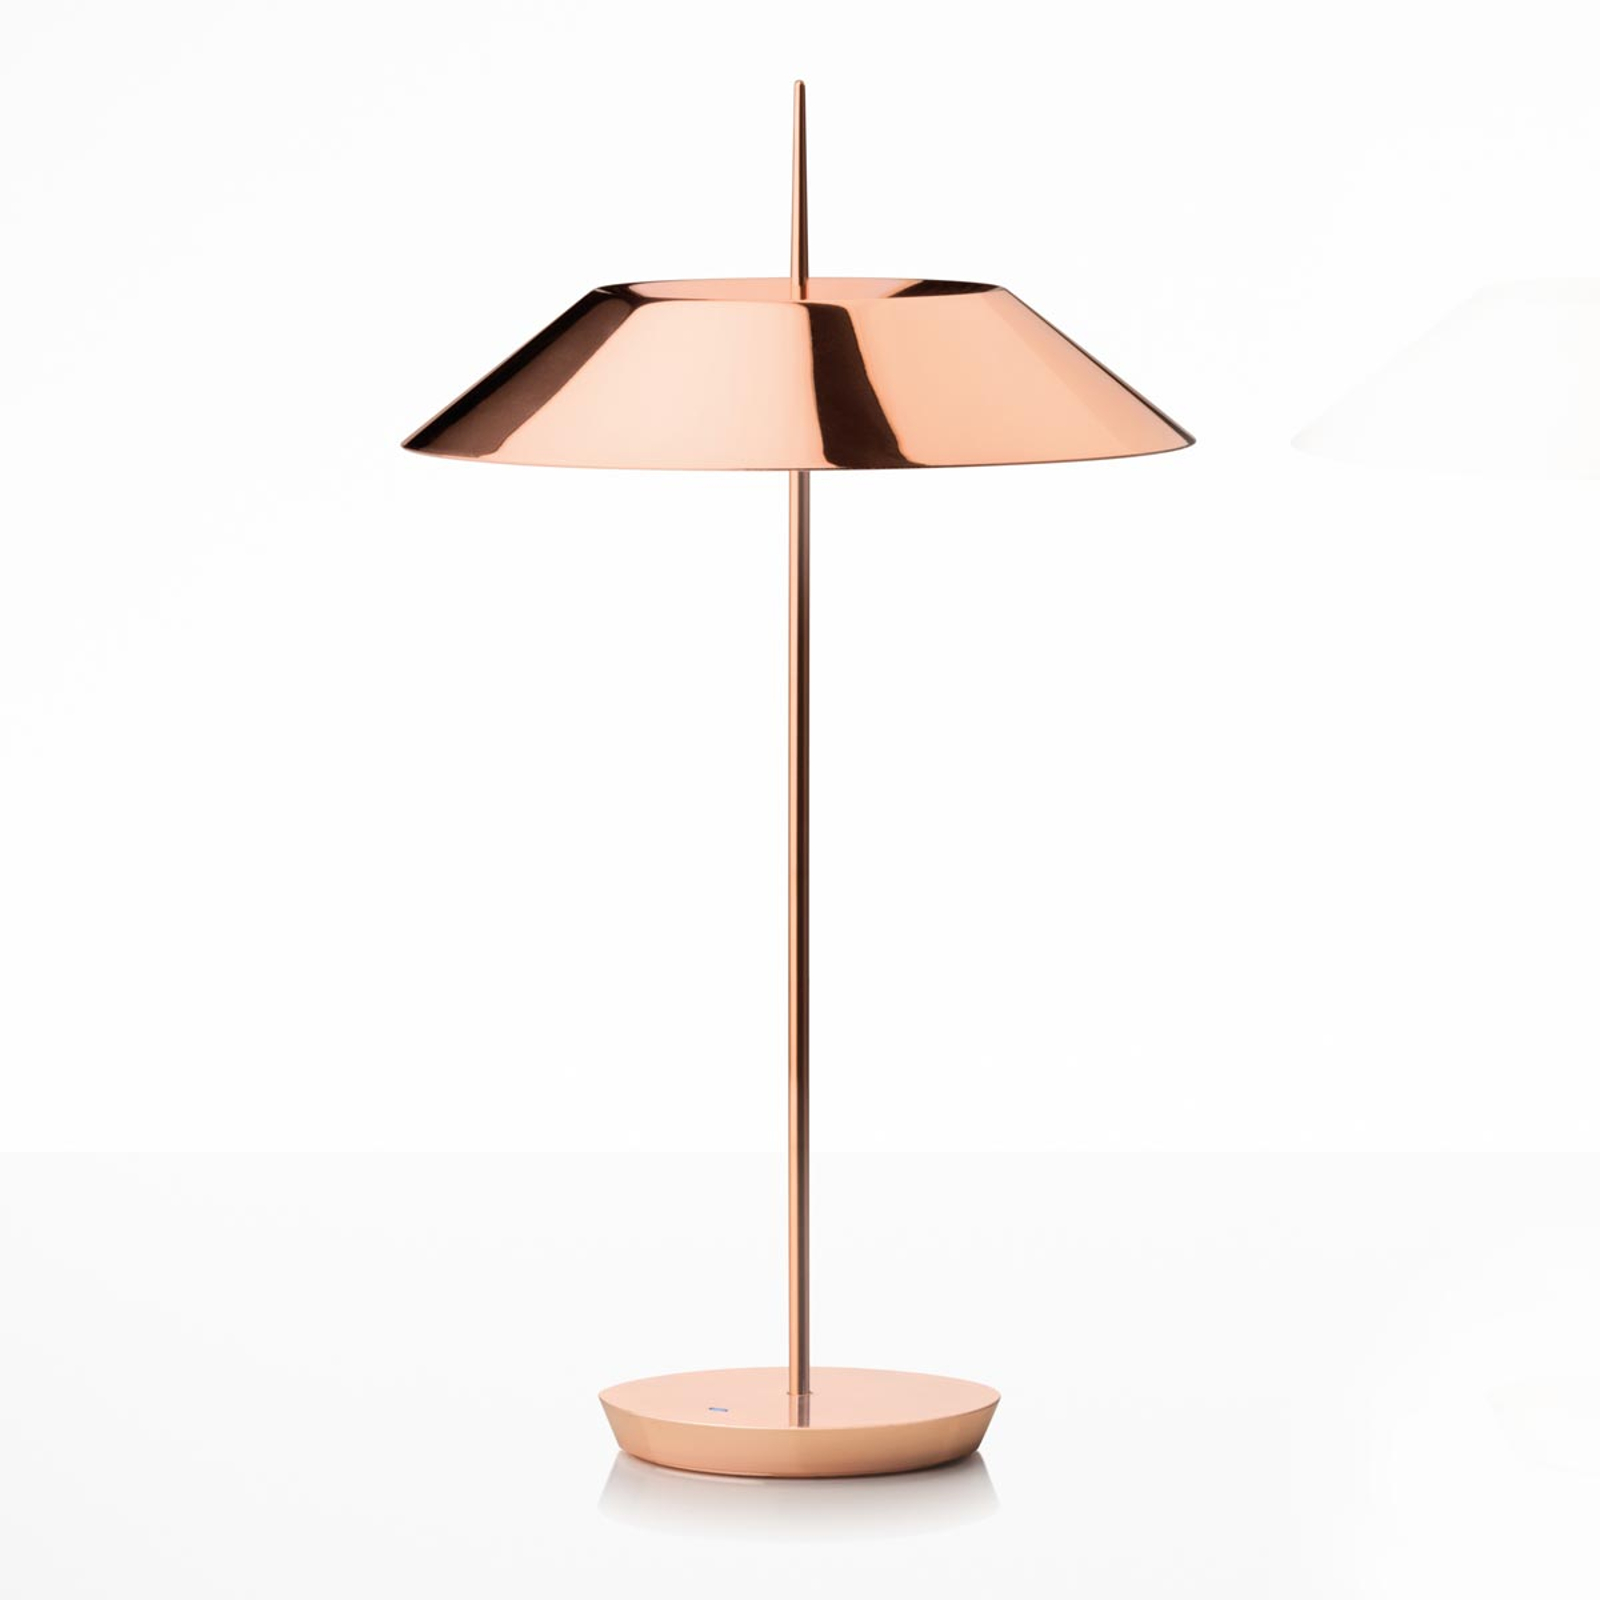 Lampada da tavolo LED Mayfair con sensore ottico